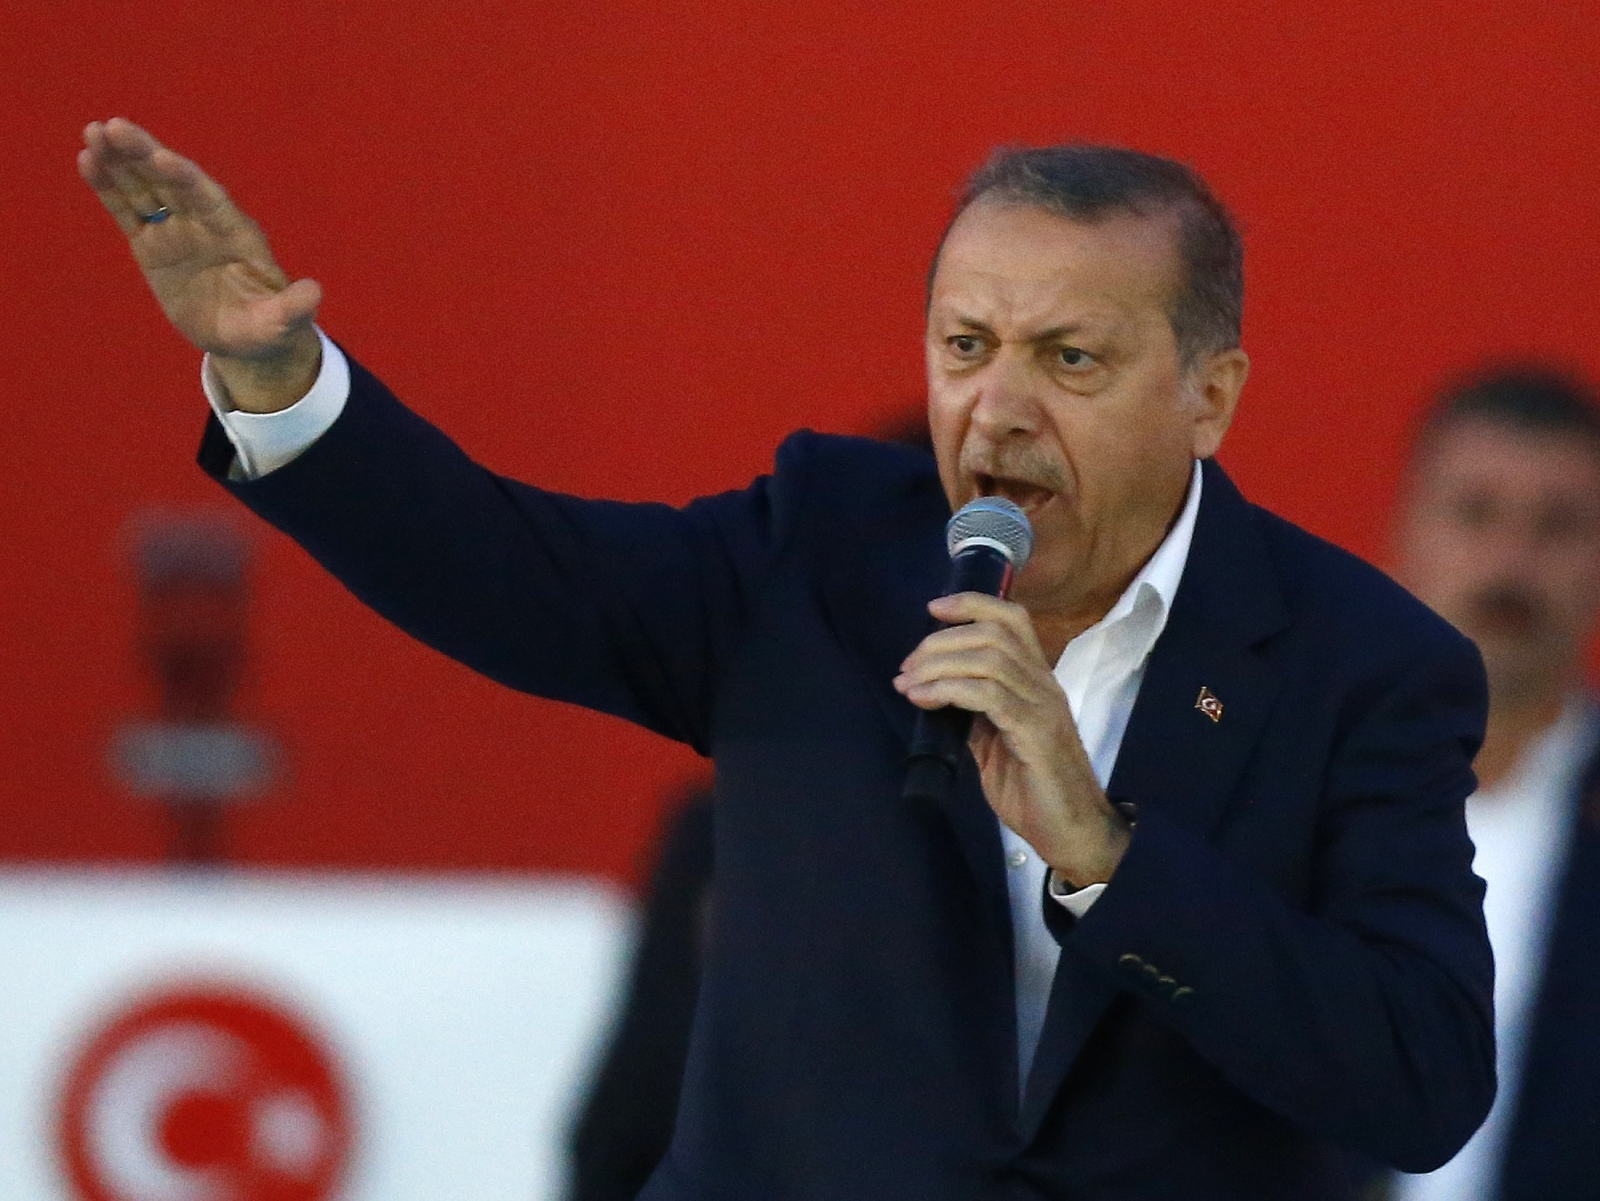 Erdogan Turkey rally